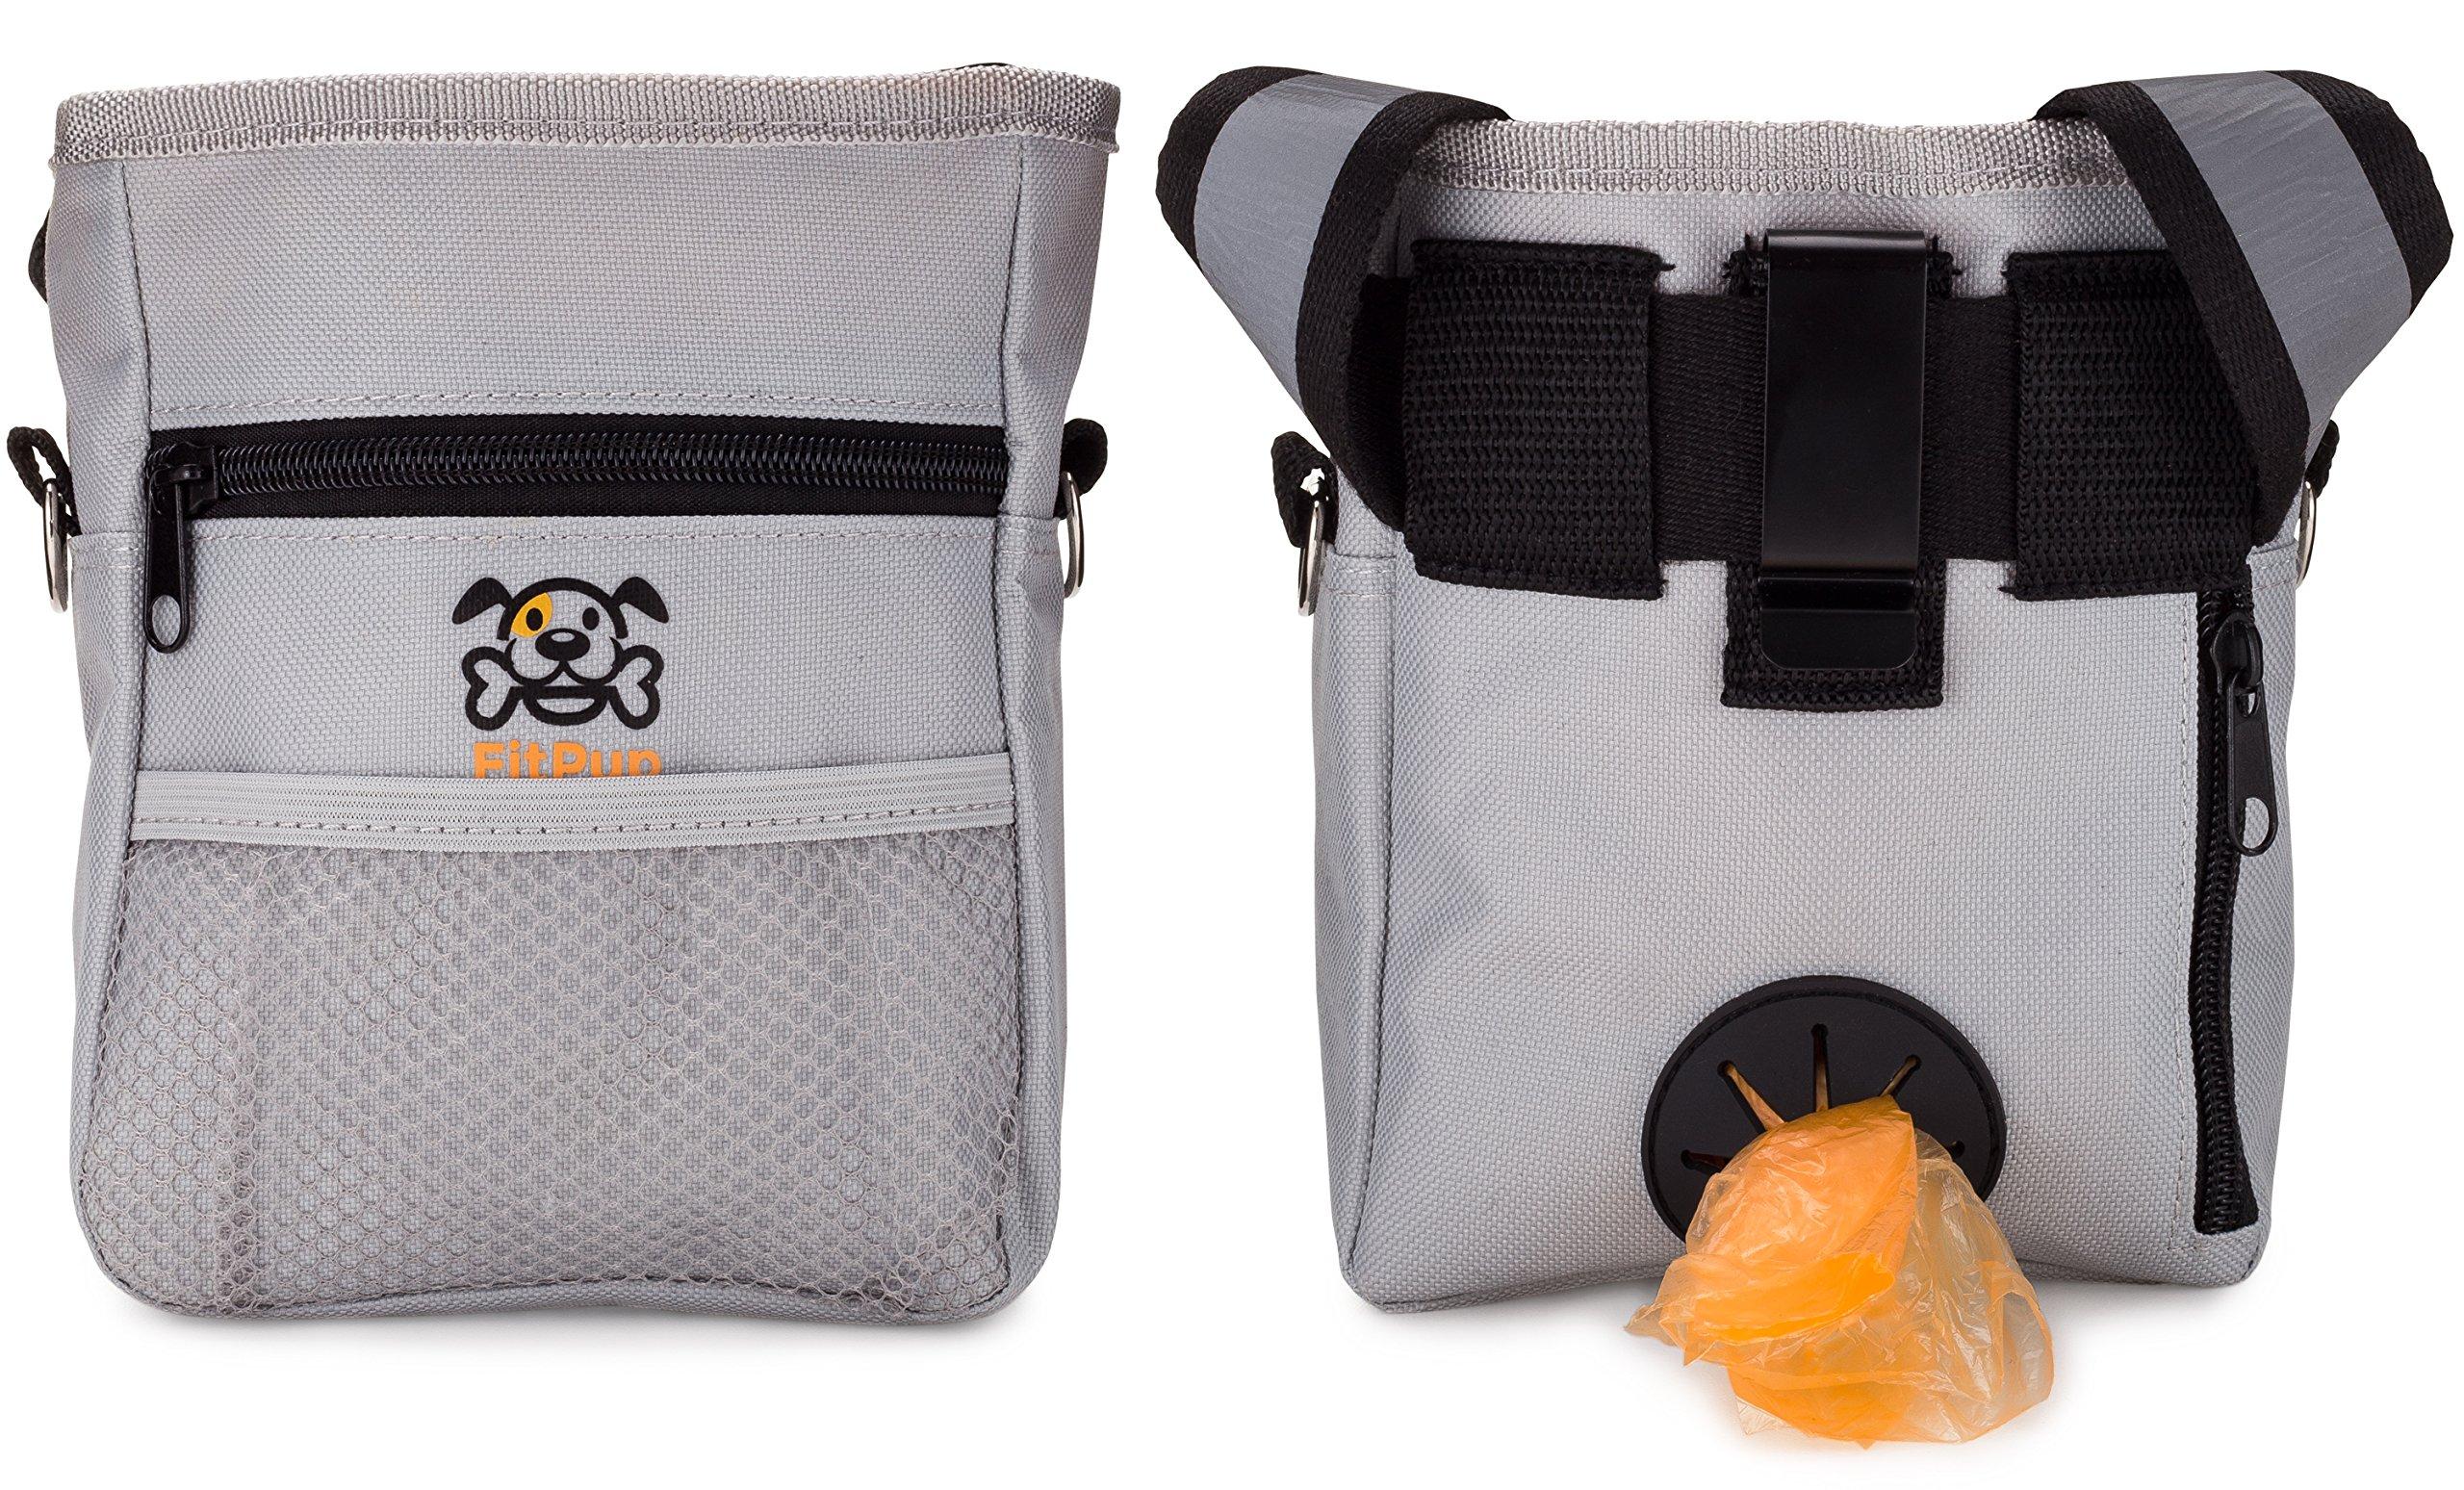 Dog Treat Training Pouch Bag, Carry Treats Toys, Poop Bag Dispenser, 1 Roll Poop Bags, Reflective Lining Stitching, Adjustable Waist Belt, Over the Shoulder Strap, Metal Belt Clip, Zippered Pockets